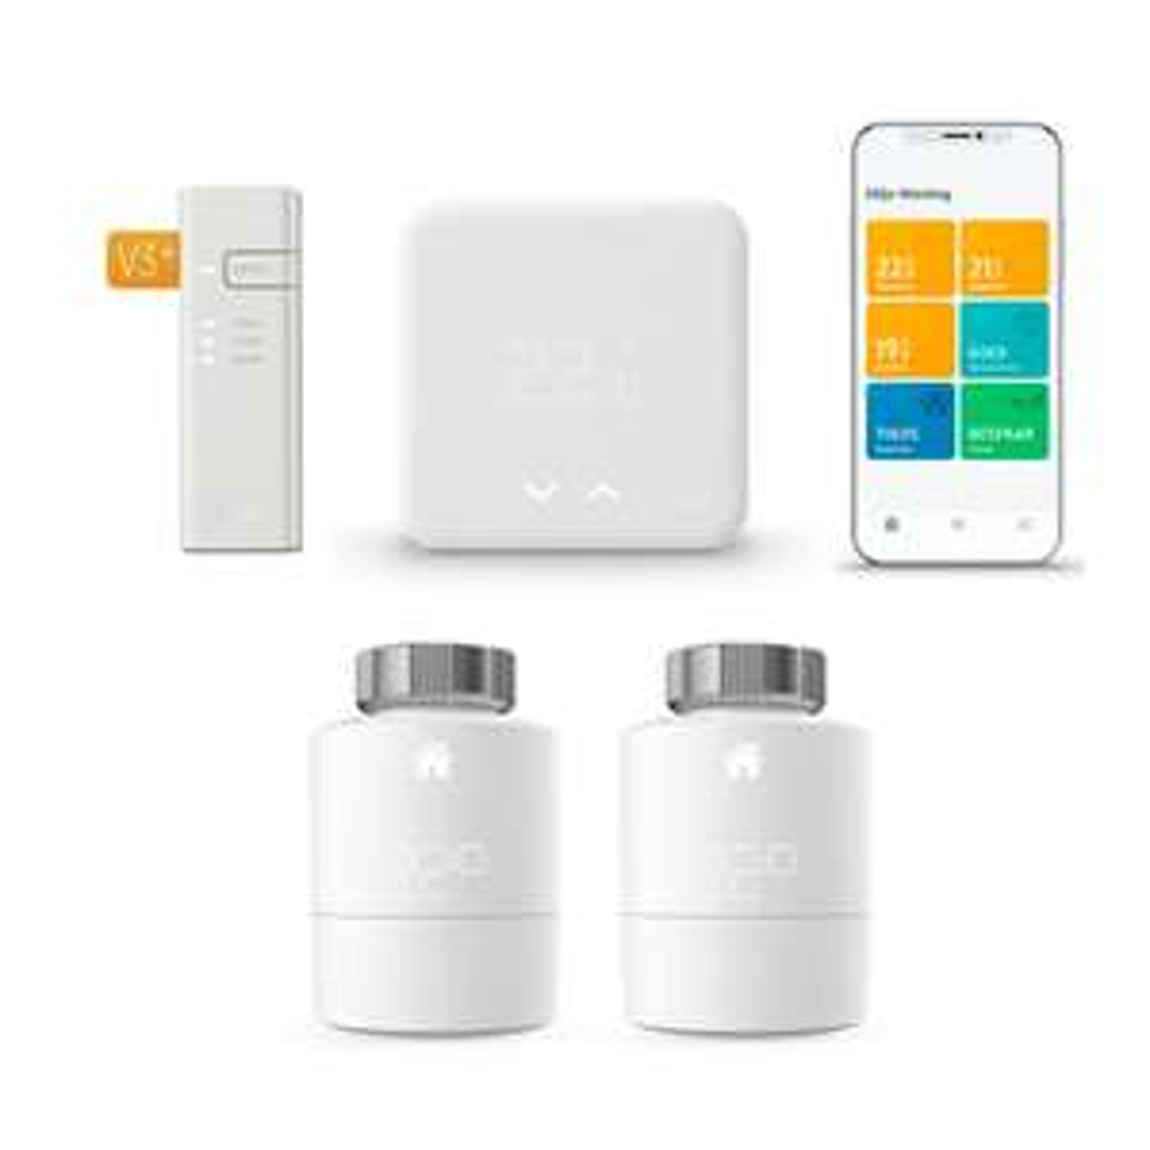 Tado Thermostaat Starter Kit V3+ + Radiatorknoppen 2-pack + Installatieservice of Google Nest Mini @Tink.nl